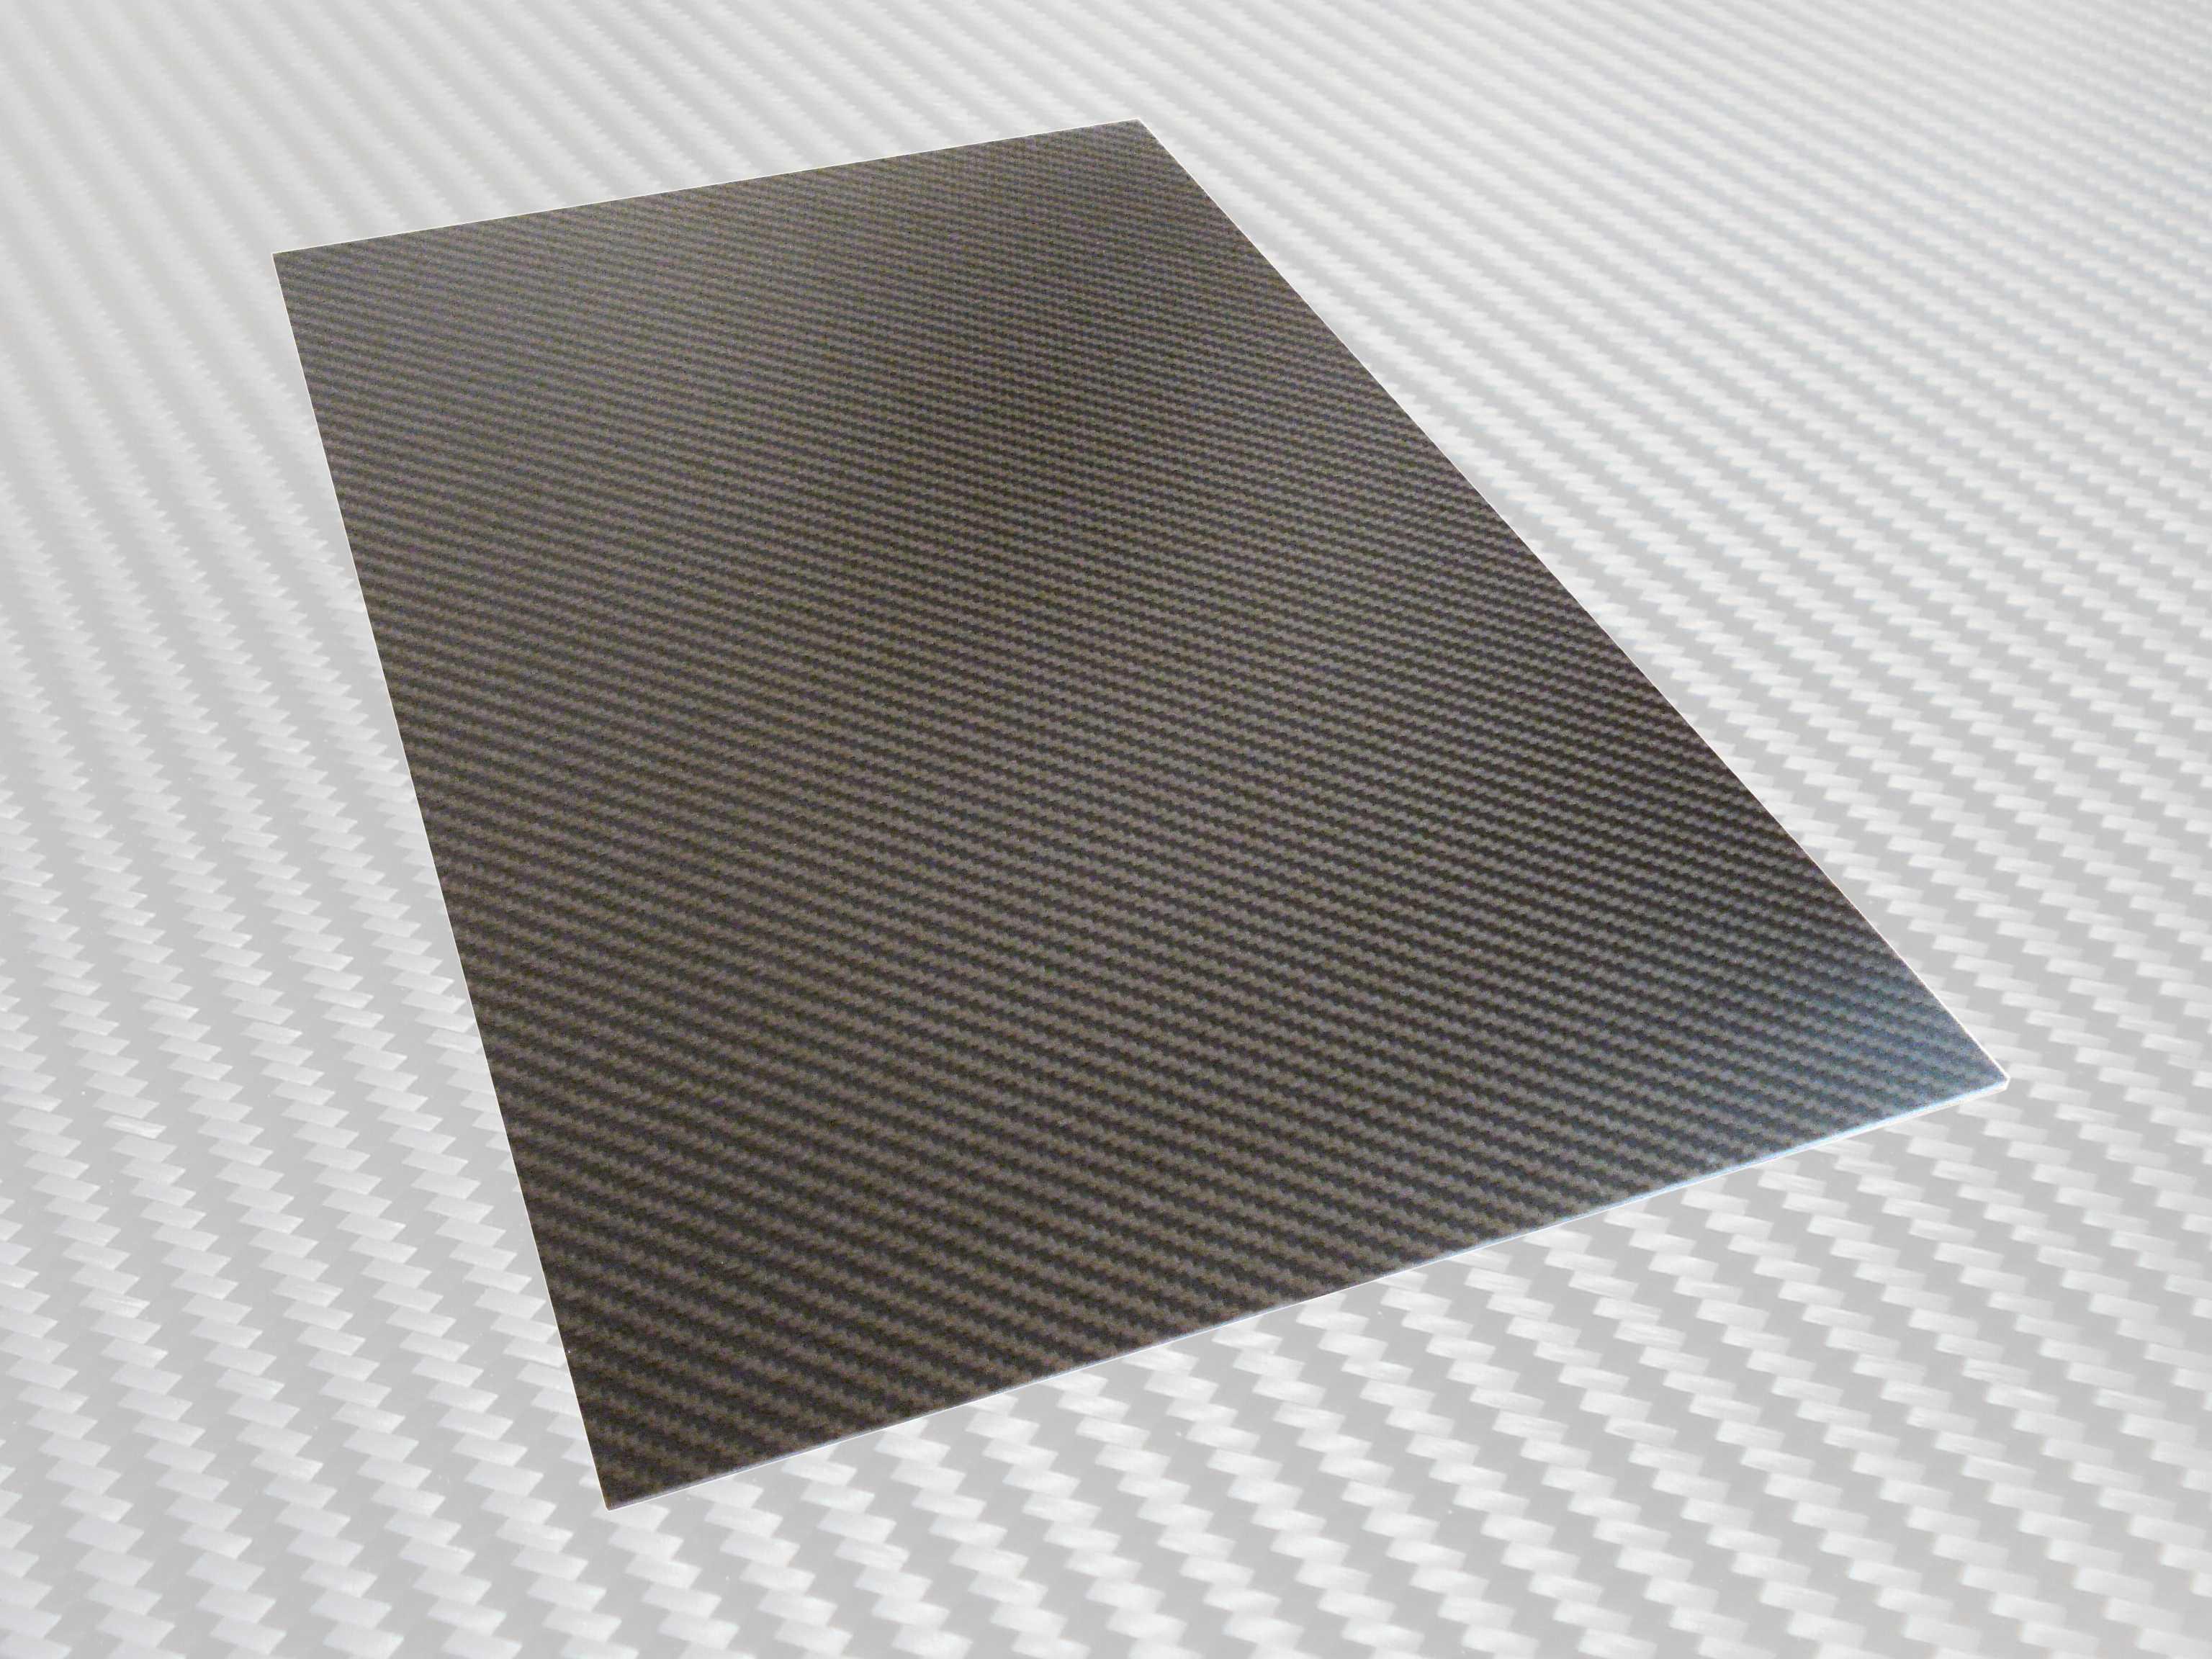 Ahltecshop Carbon Platte Hochglanz 480 X 280 Mm 1 0 Mm